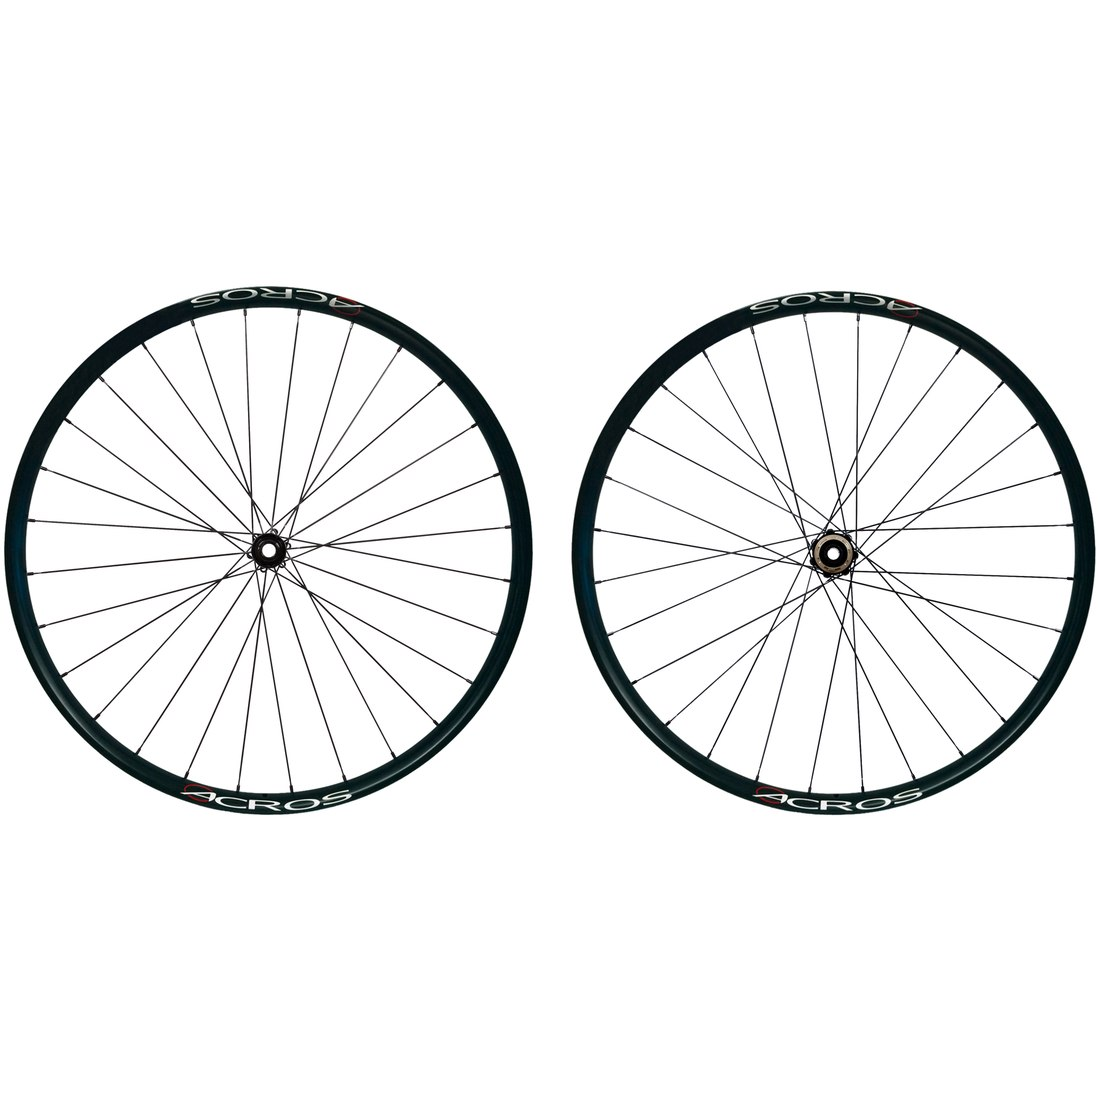 "ACROS A-Wheel XC Race 29"" Carbon Wheelset - 6-Bolt - FW: 15x100mm | RW: 12x142mm"